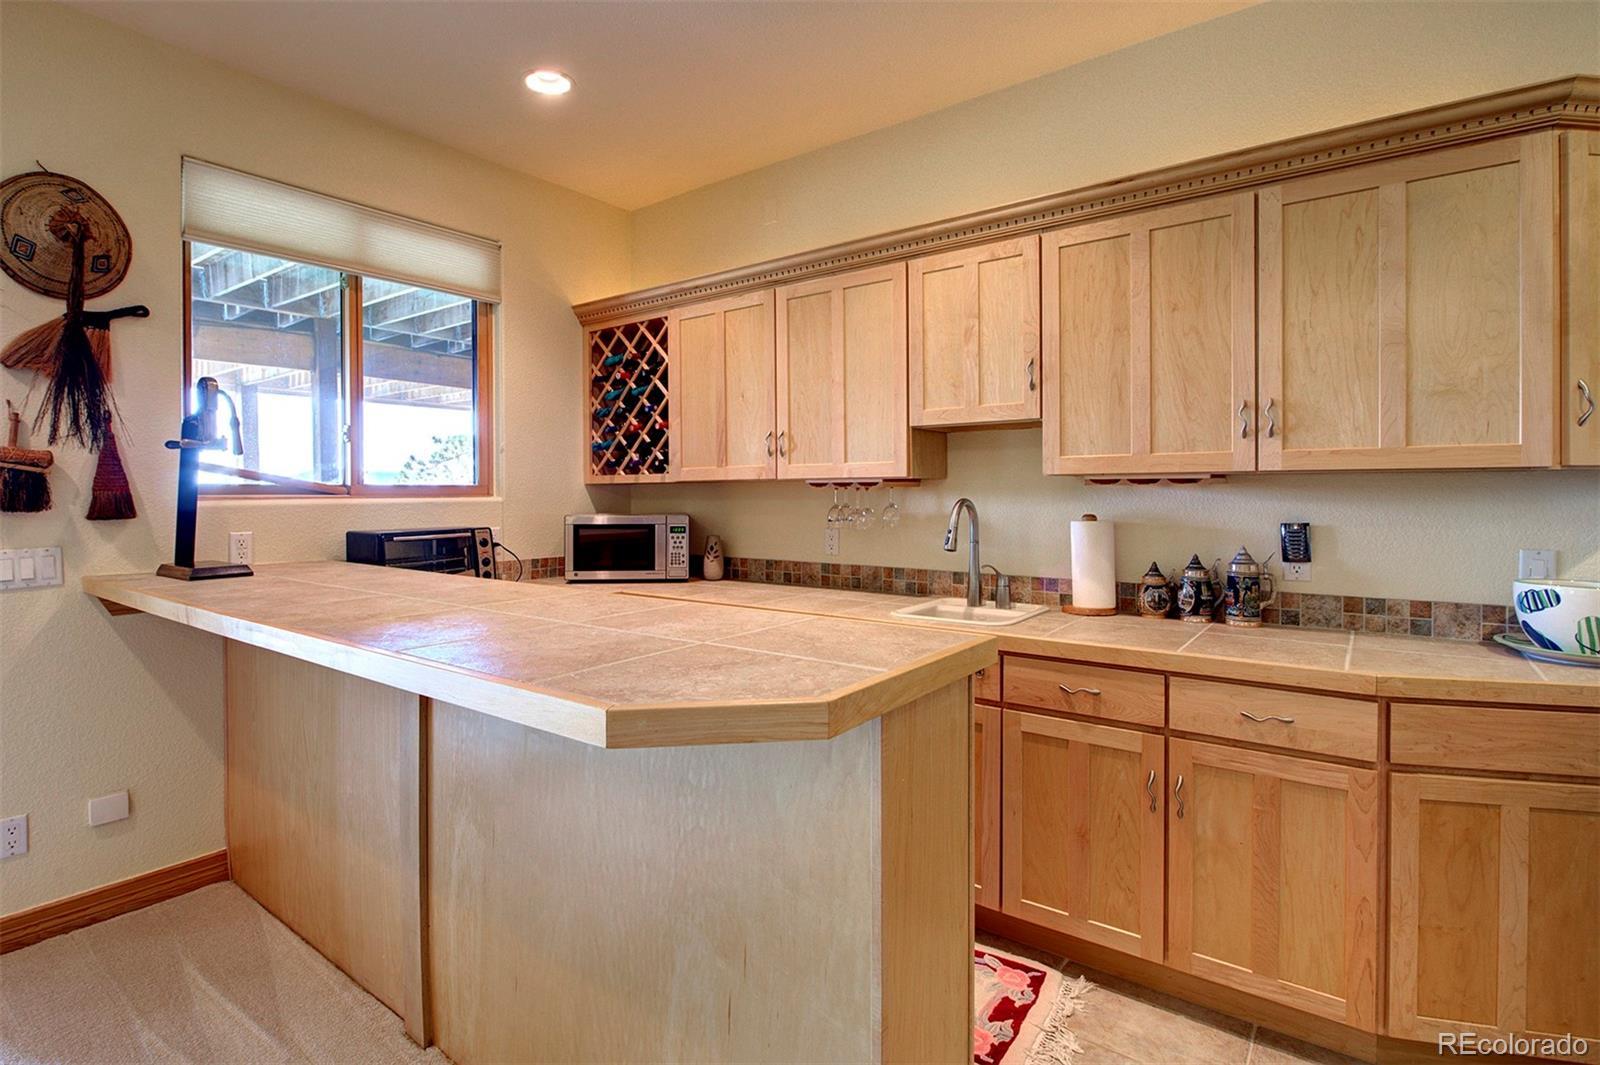 MLS# 9731389 - 24 - 28237 Belle Vista Drive, Conifer, CO 80433